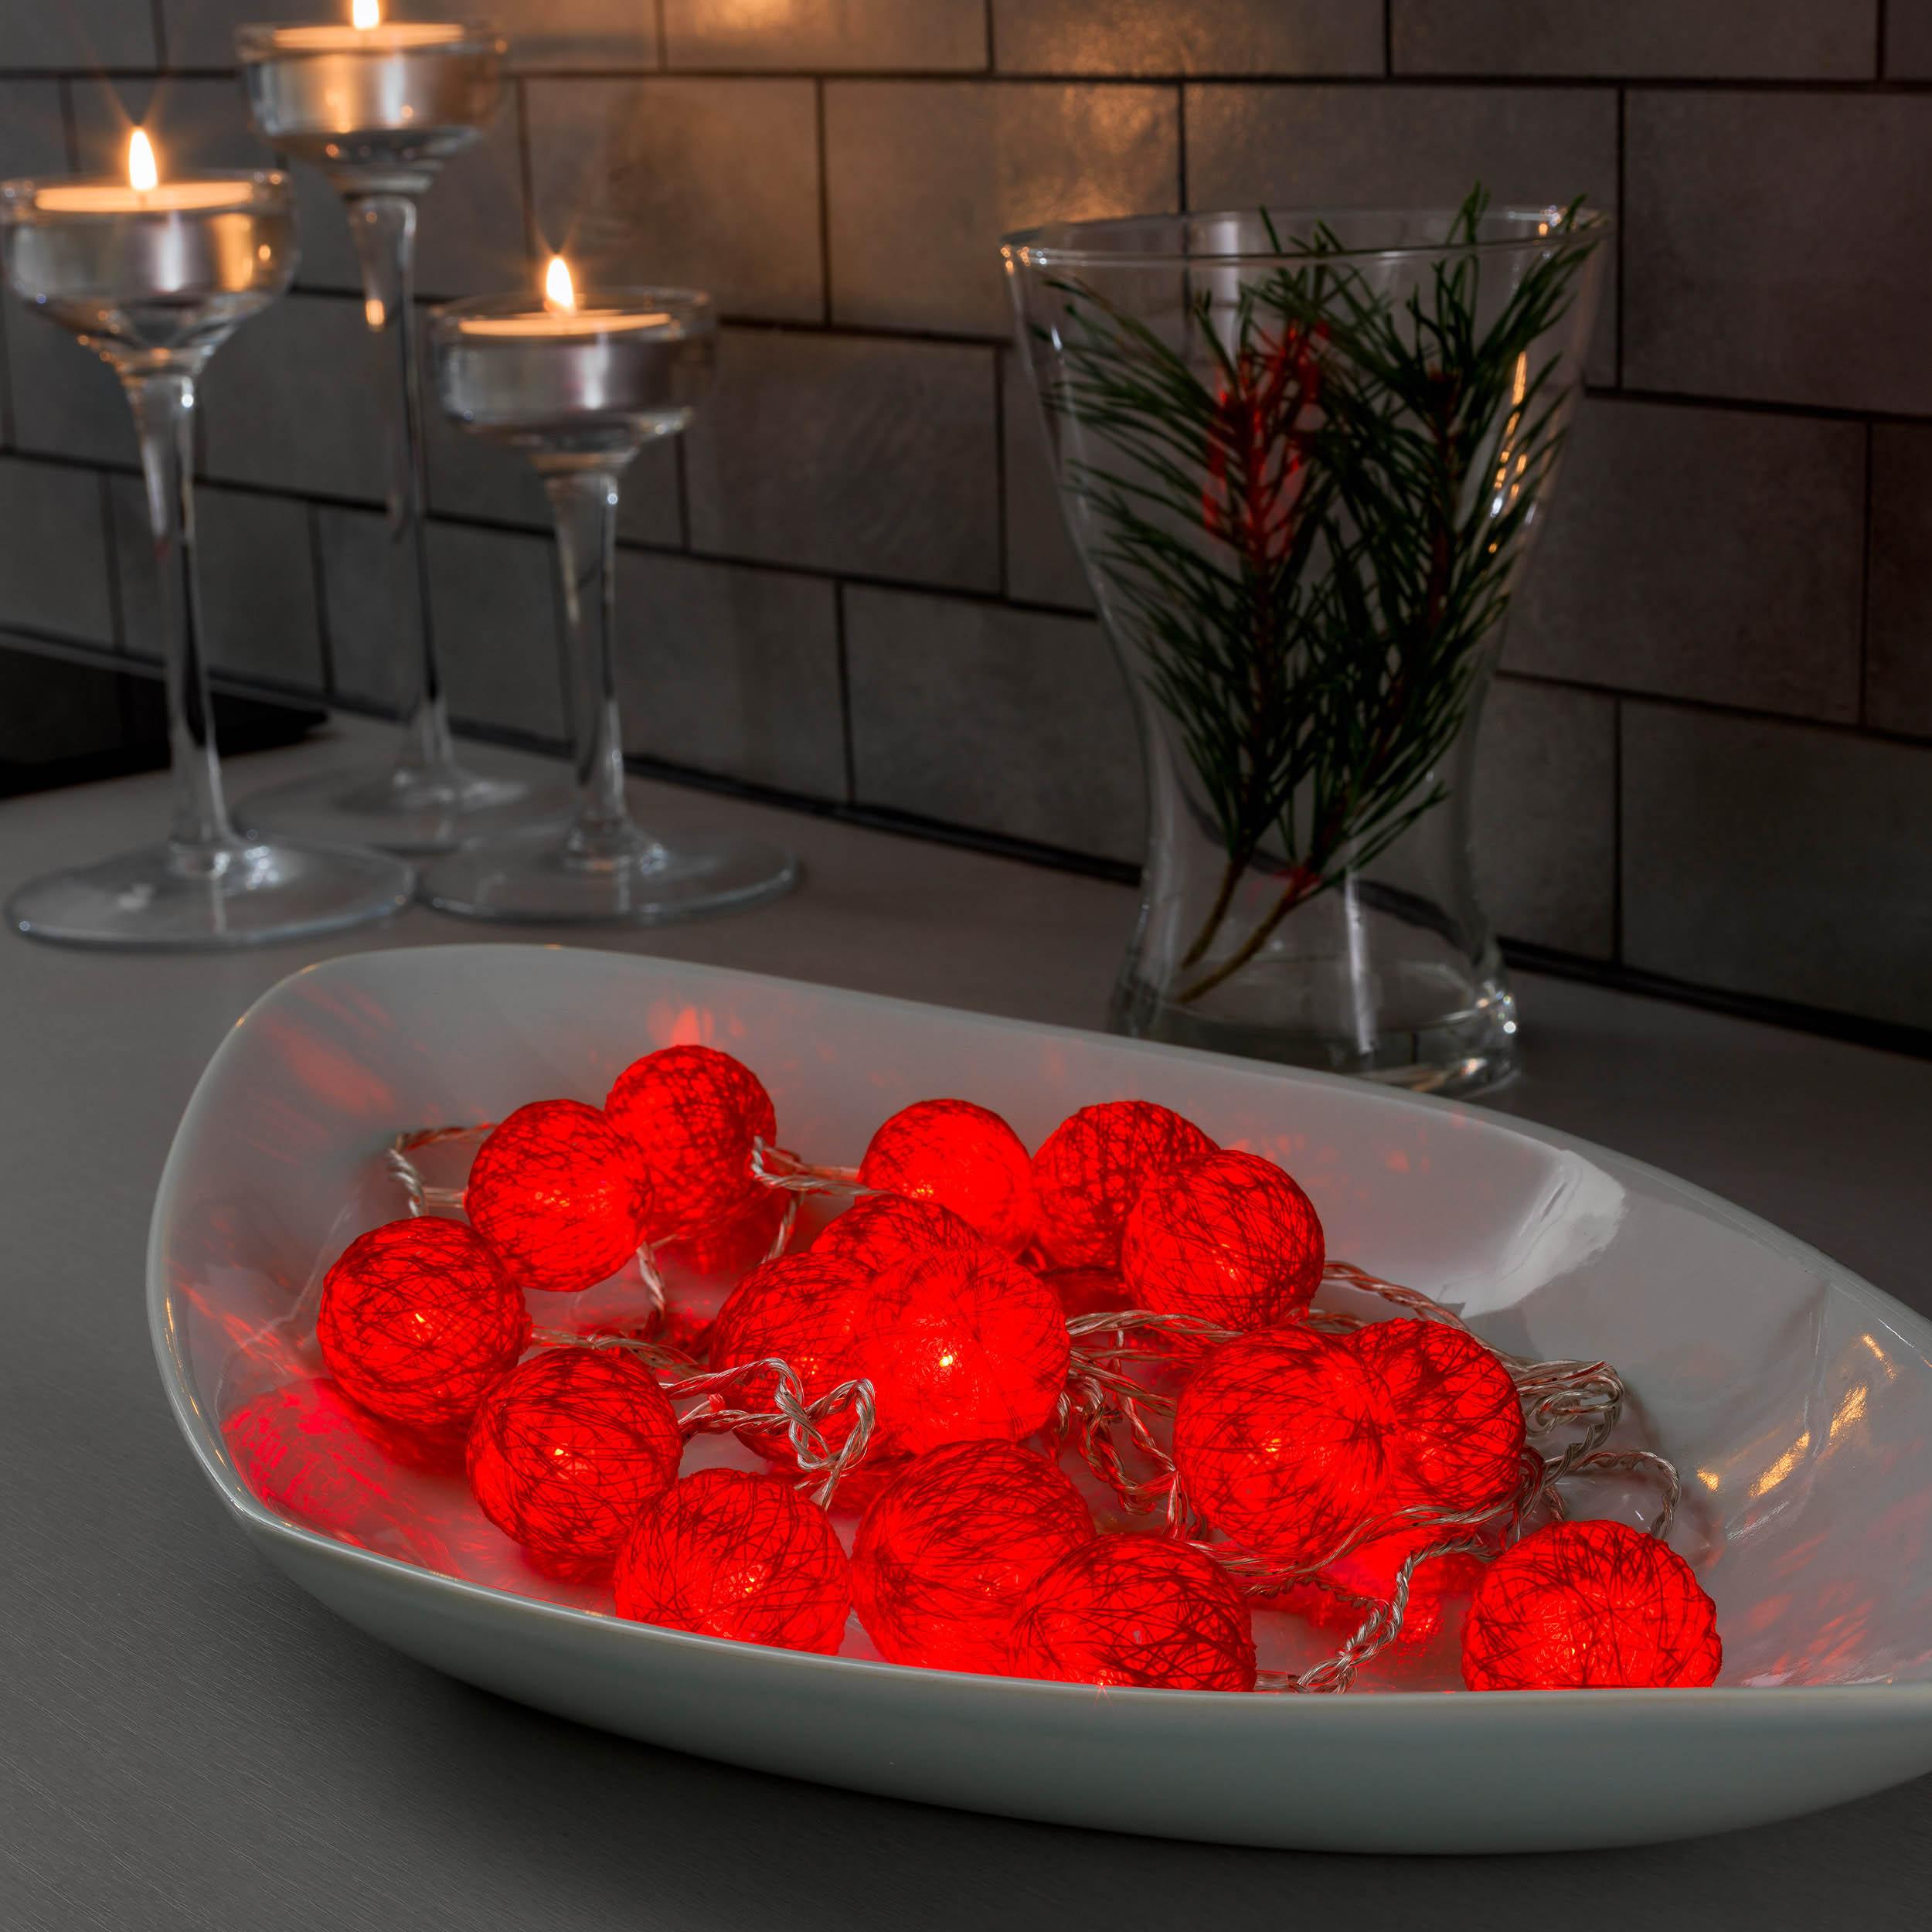 Konstsmide LED-Dekolichterkette, rote Baumwollkugeln, 3,5 cm 3135-553